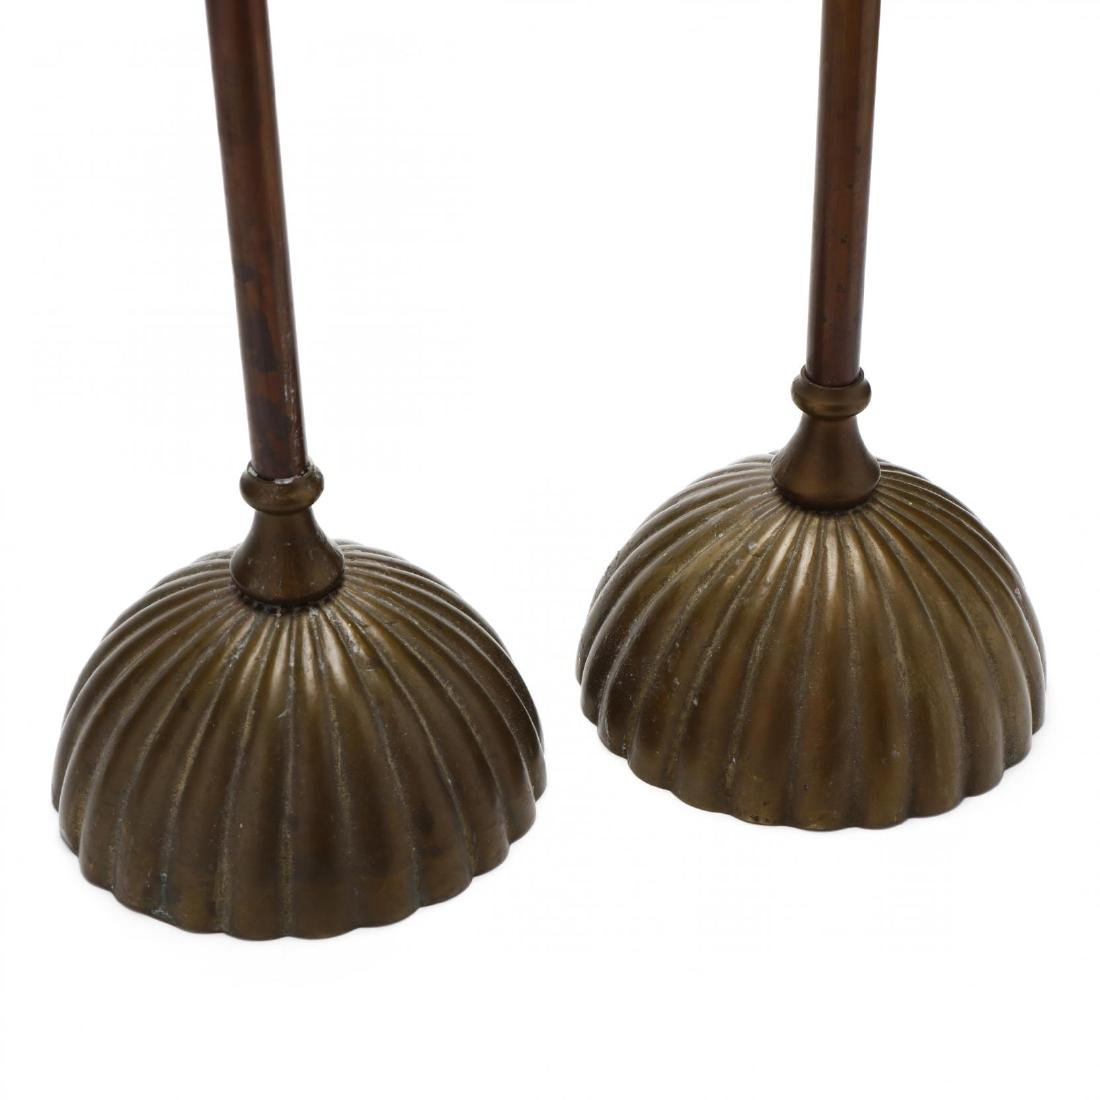 Silvestri, Pair of Modernist Brass Pricket Sticks - 3